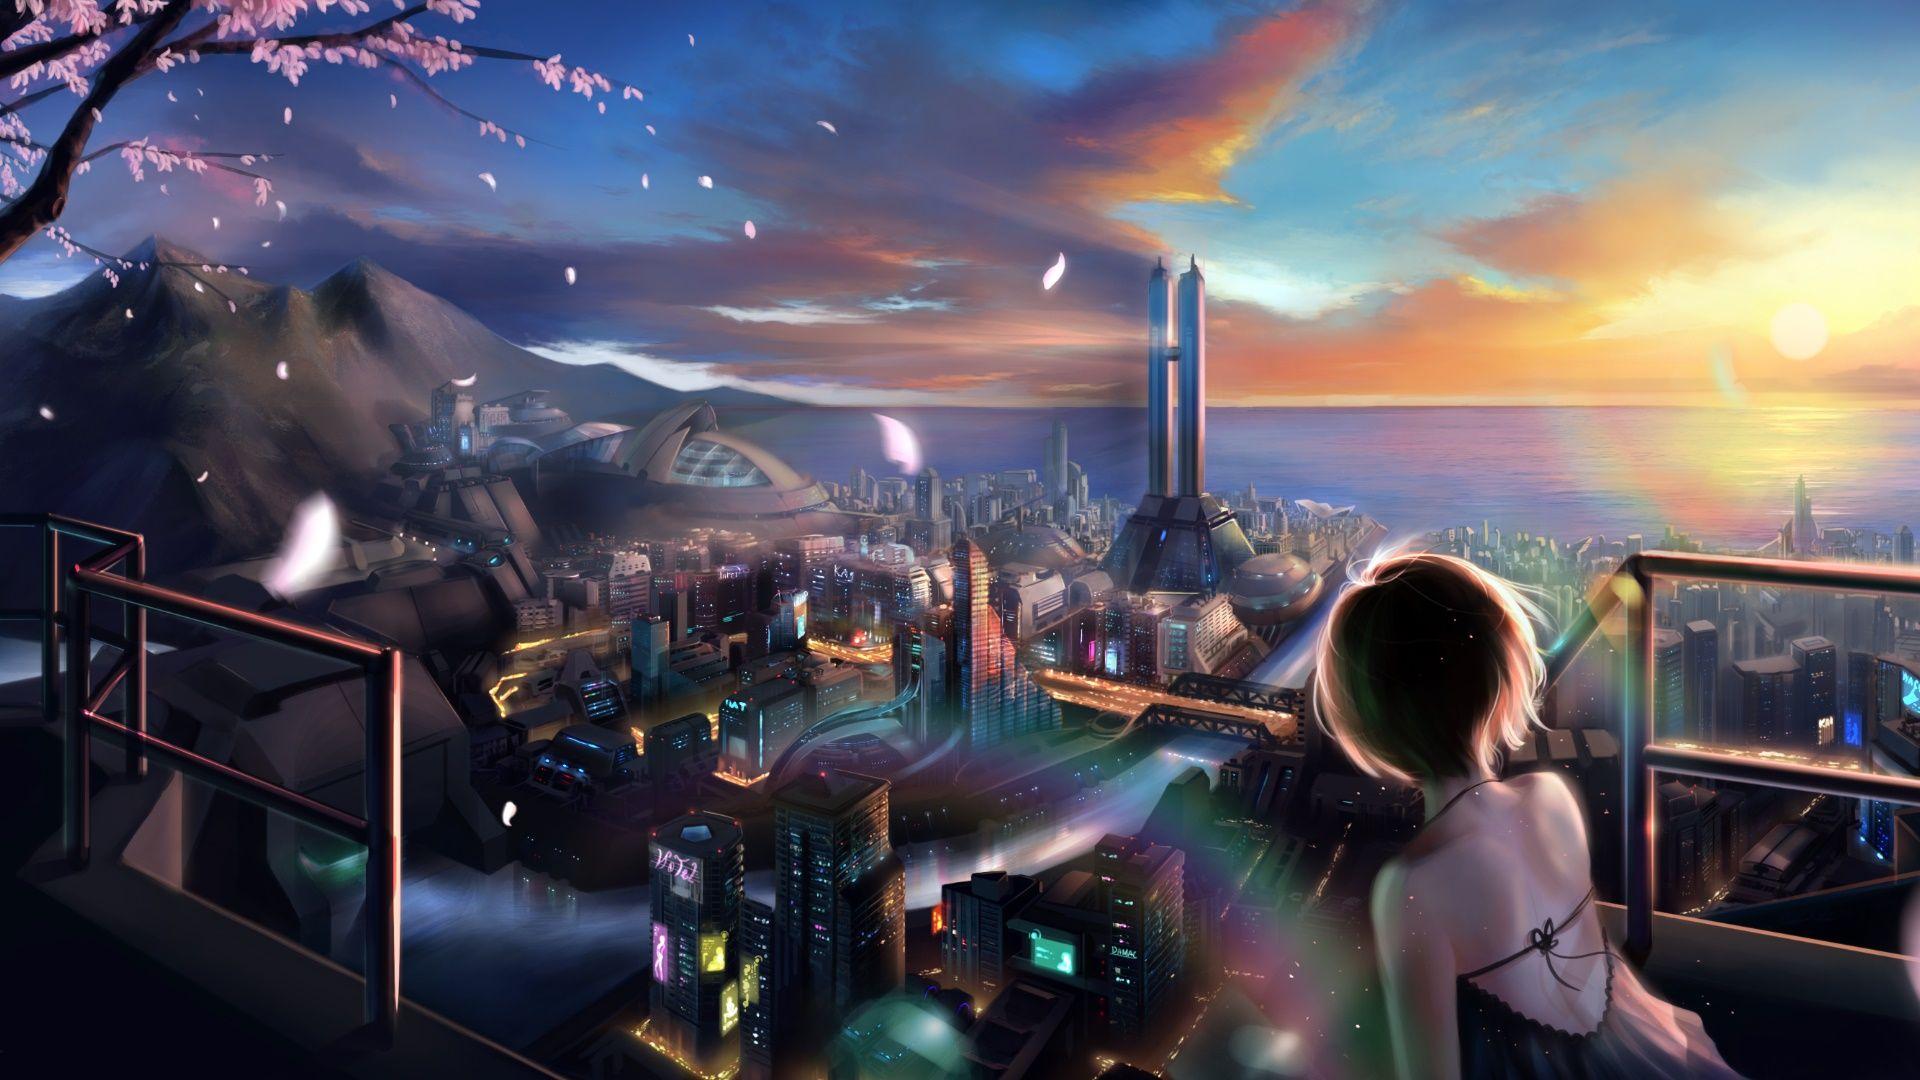 The Cyberpunk World Wallpaper Anime